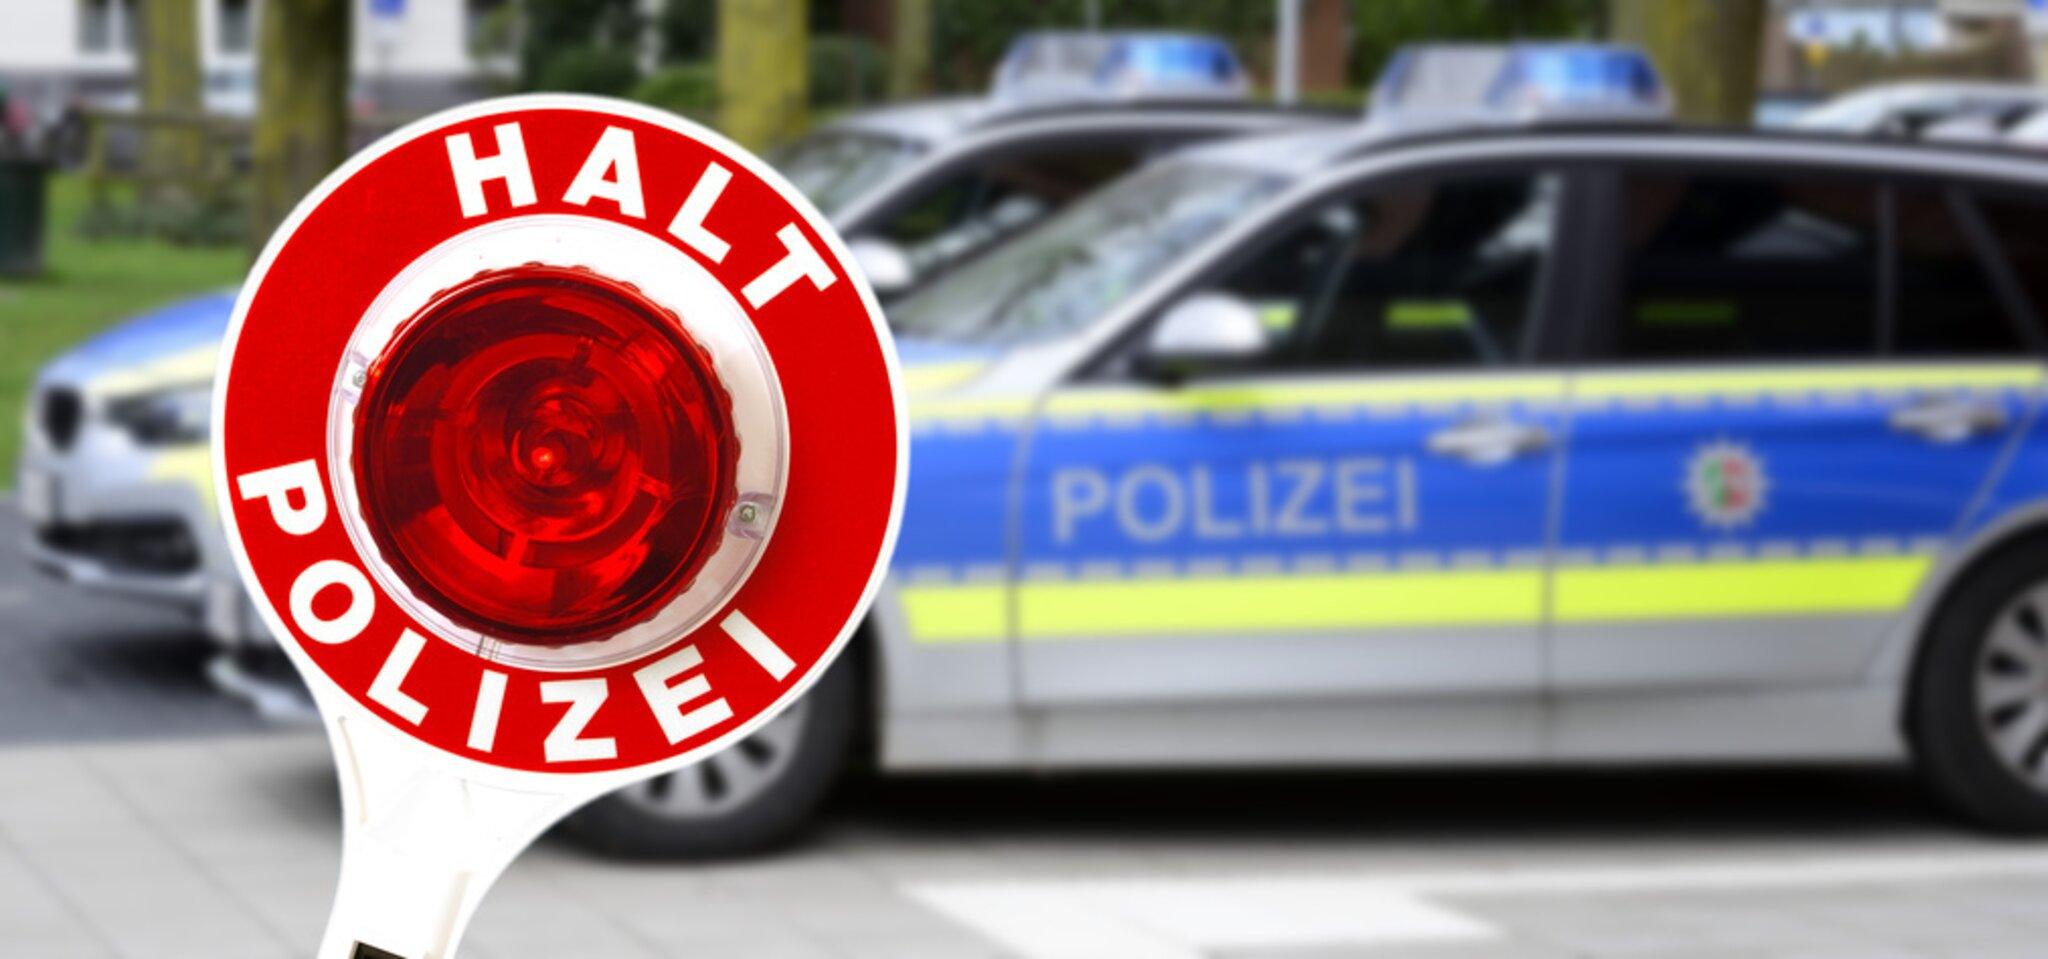 Raum-Aschaffenburg-Verkehrsunf-lle-Unfallflucht-Trunkenheitsfahrt-Pkw-angefahren-Streit-eskaliert